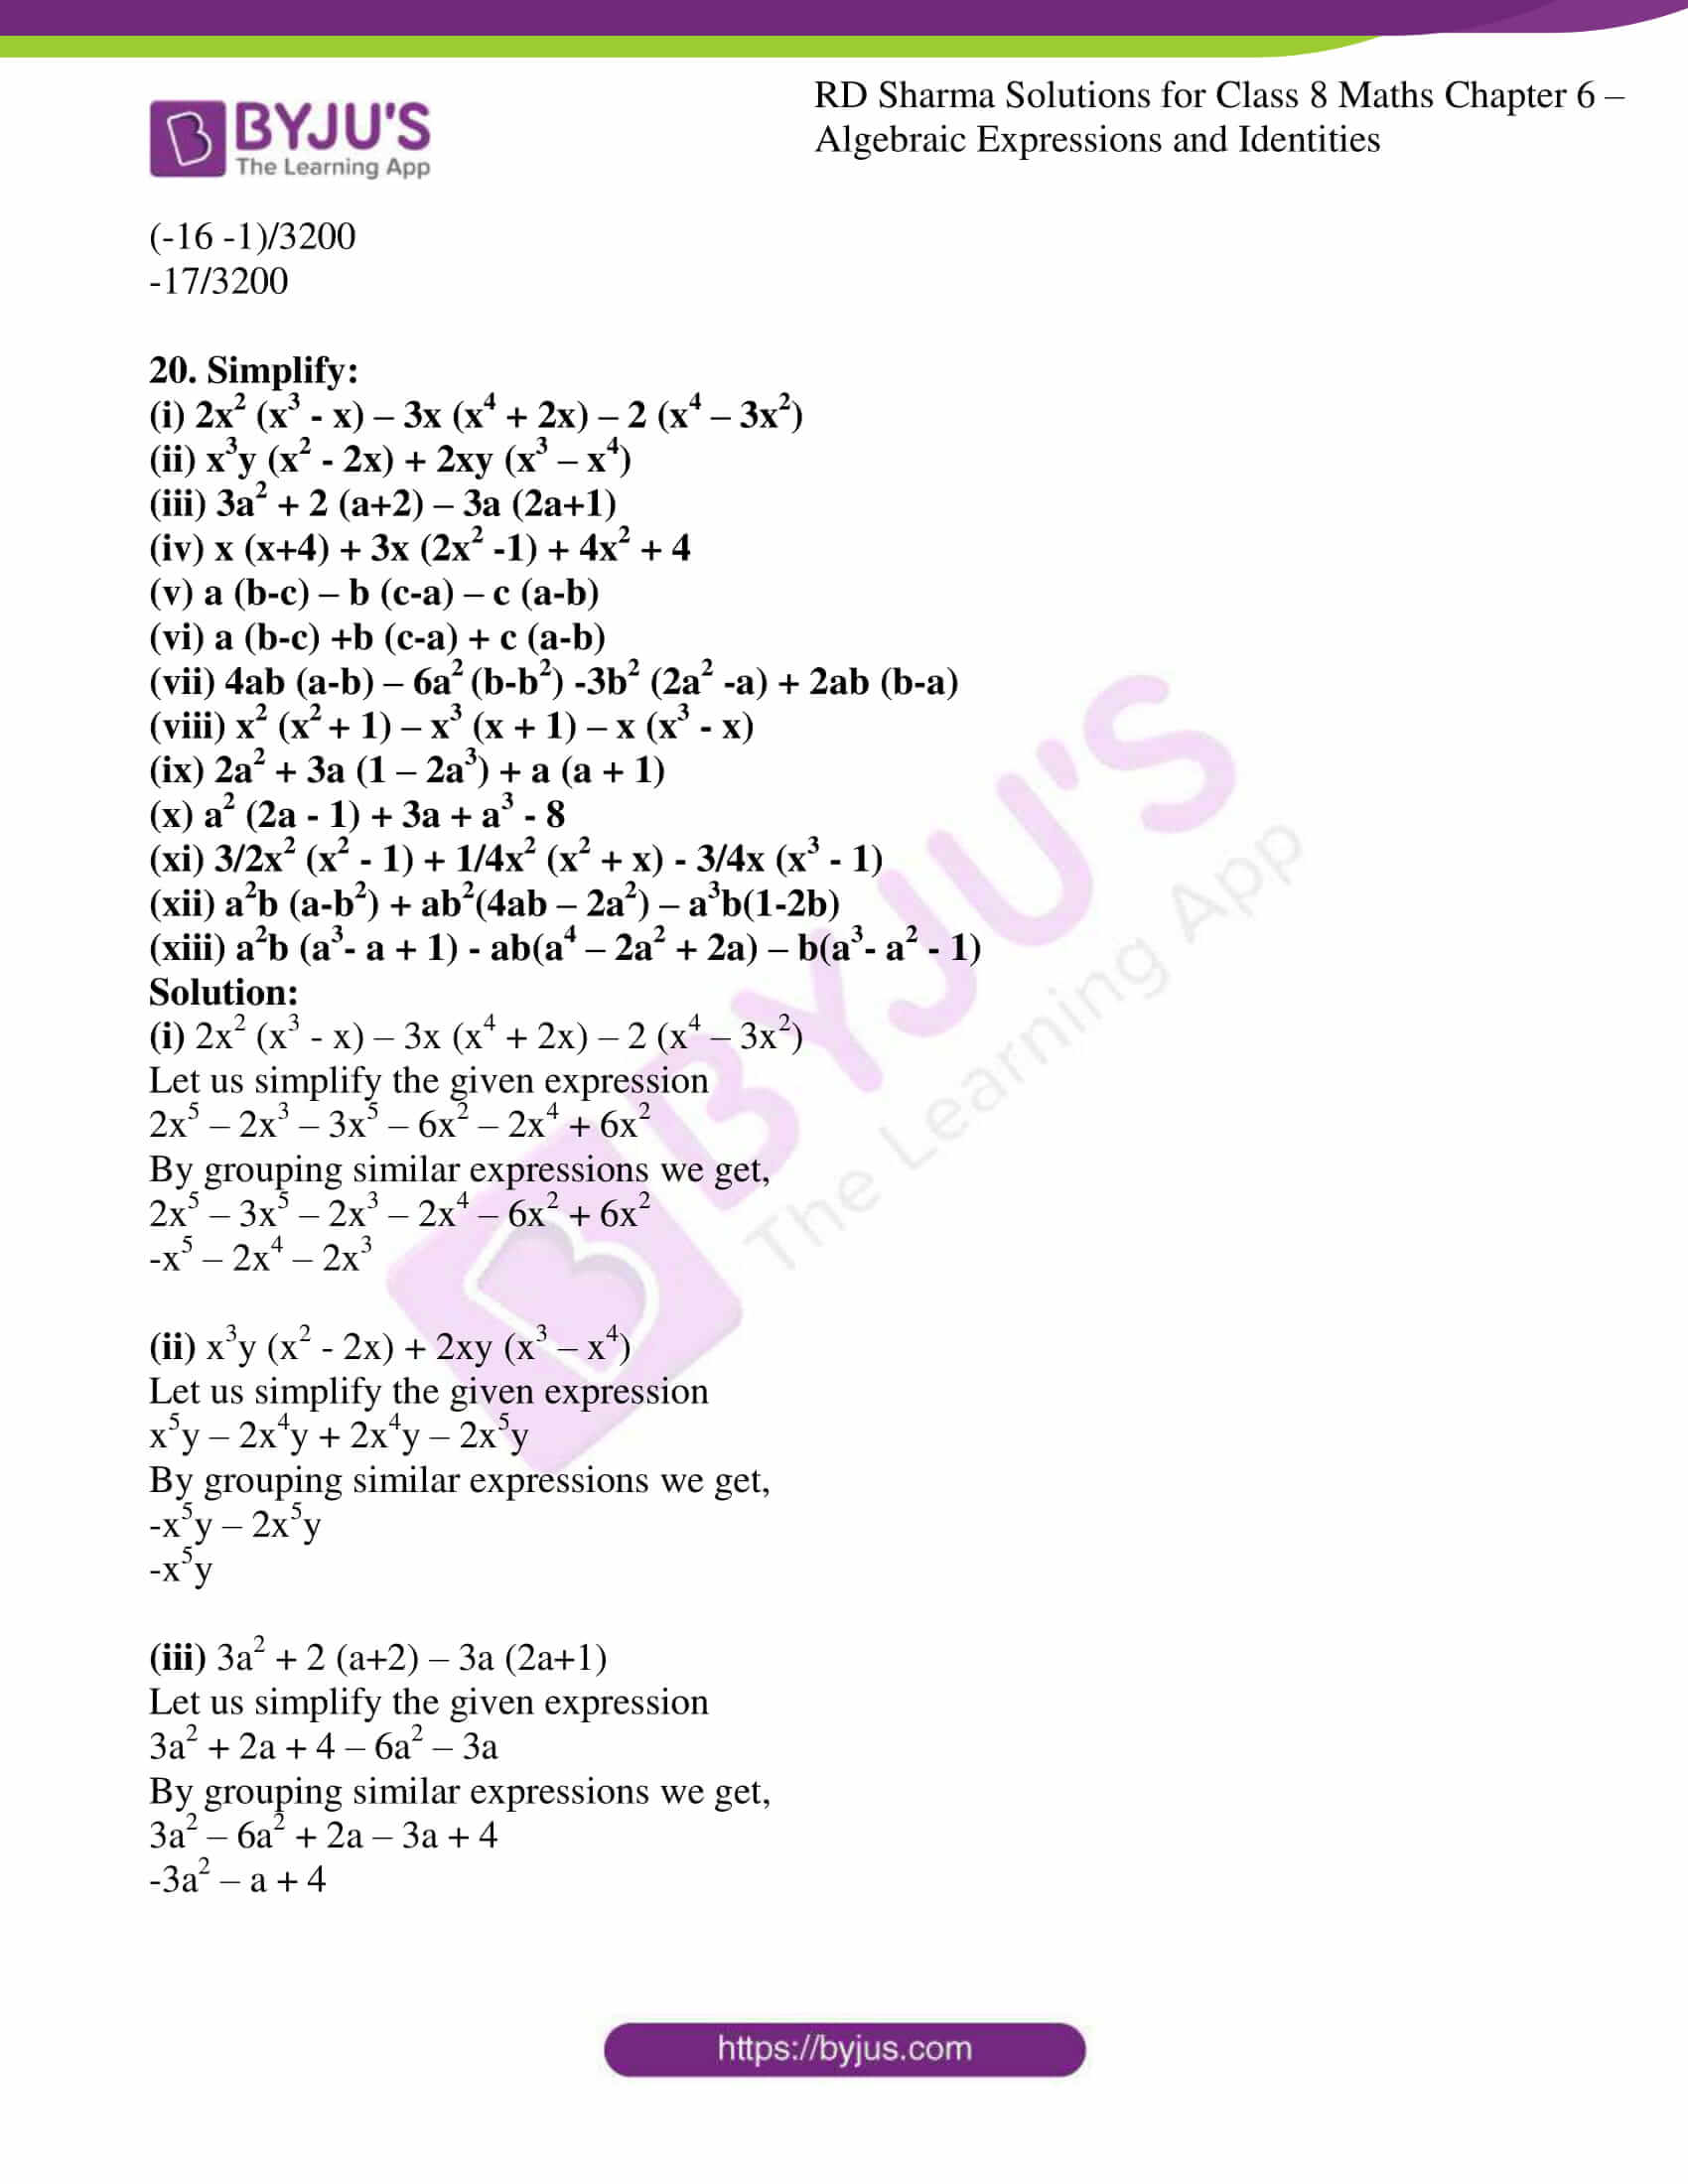 rd sharma class 8 maths chapter 6 exercise 4 6